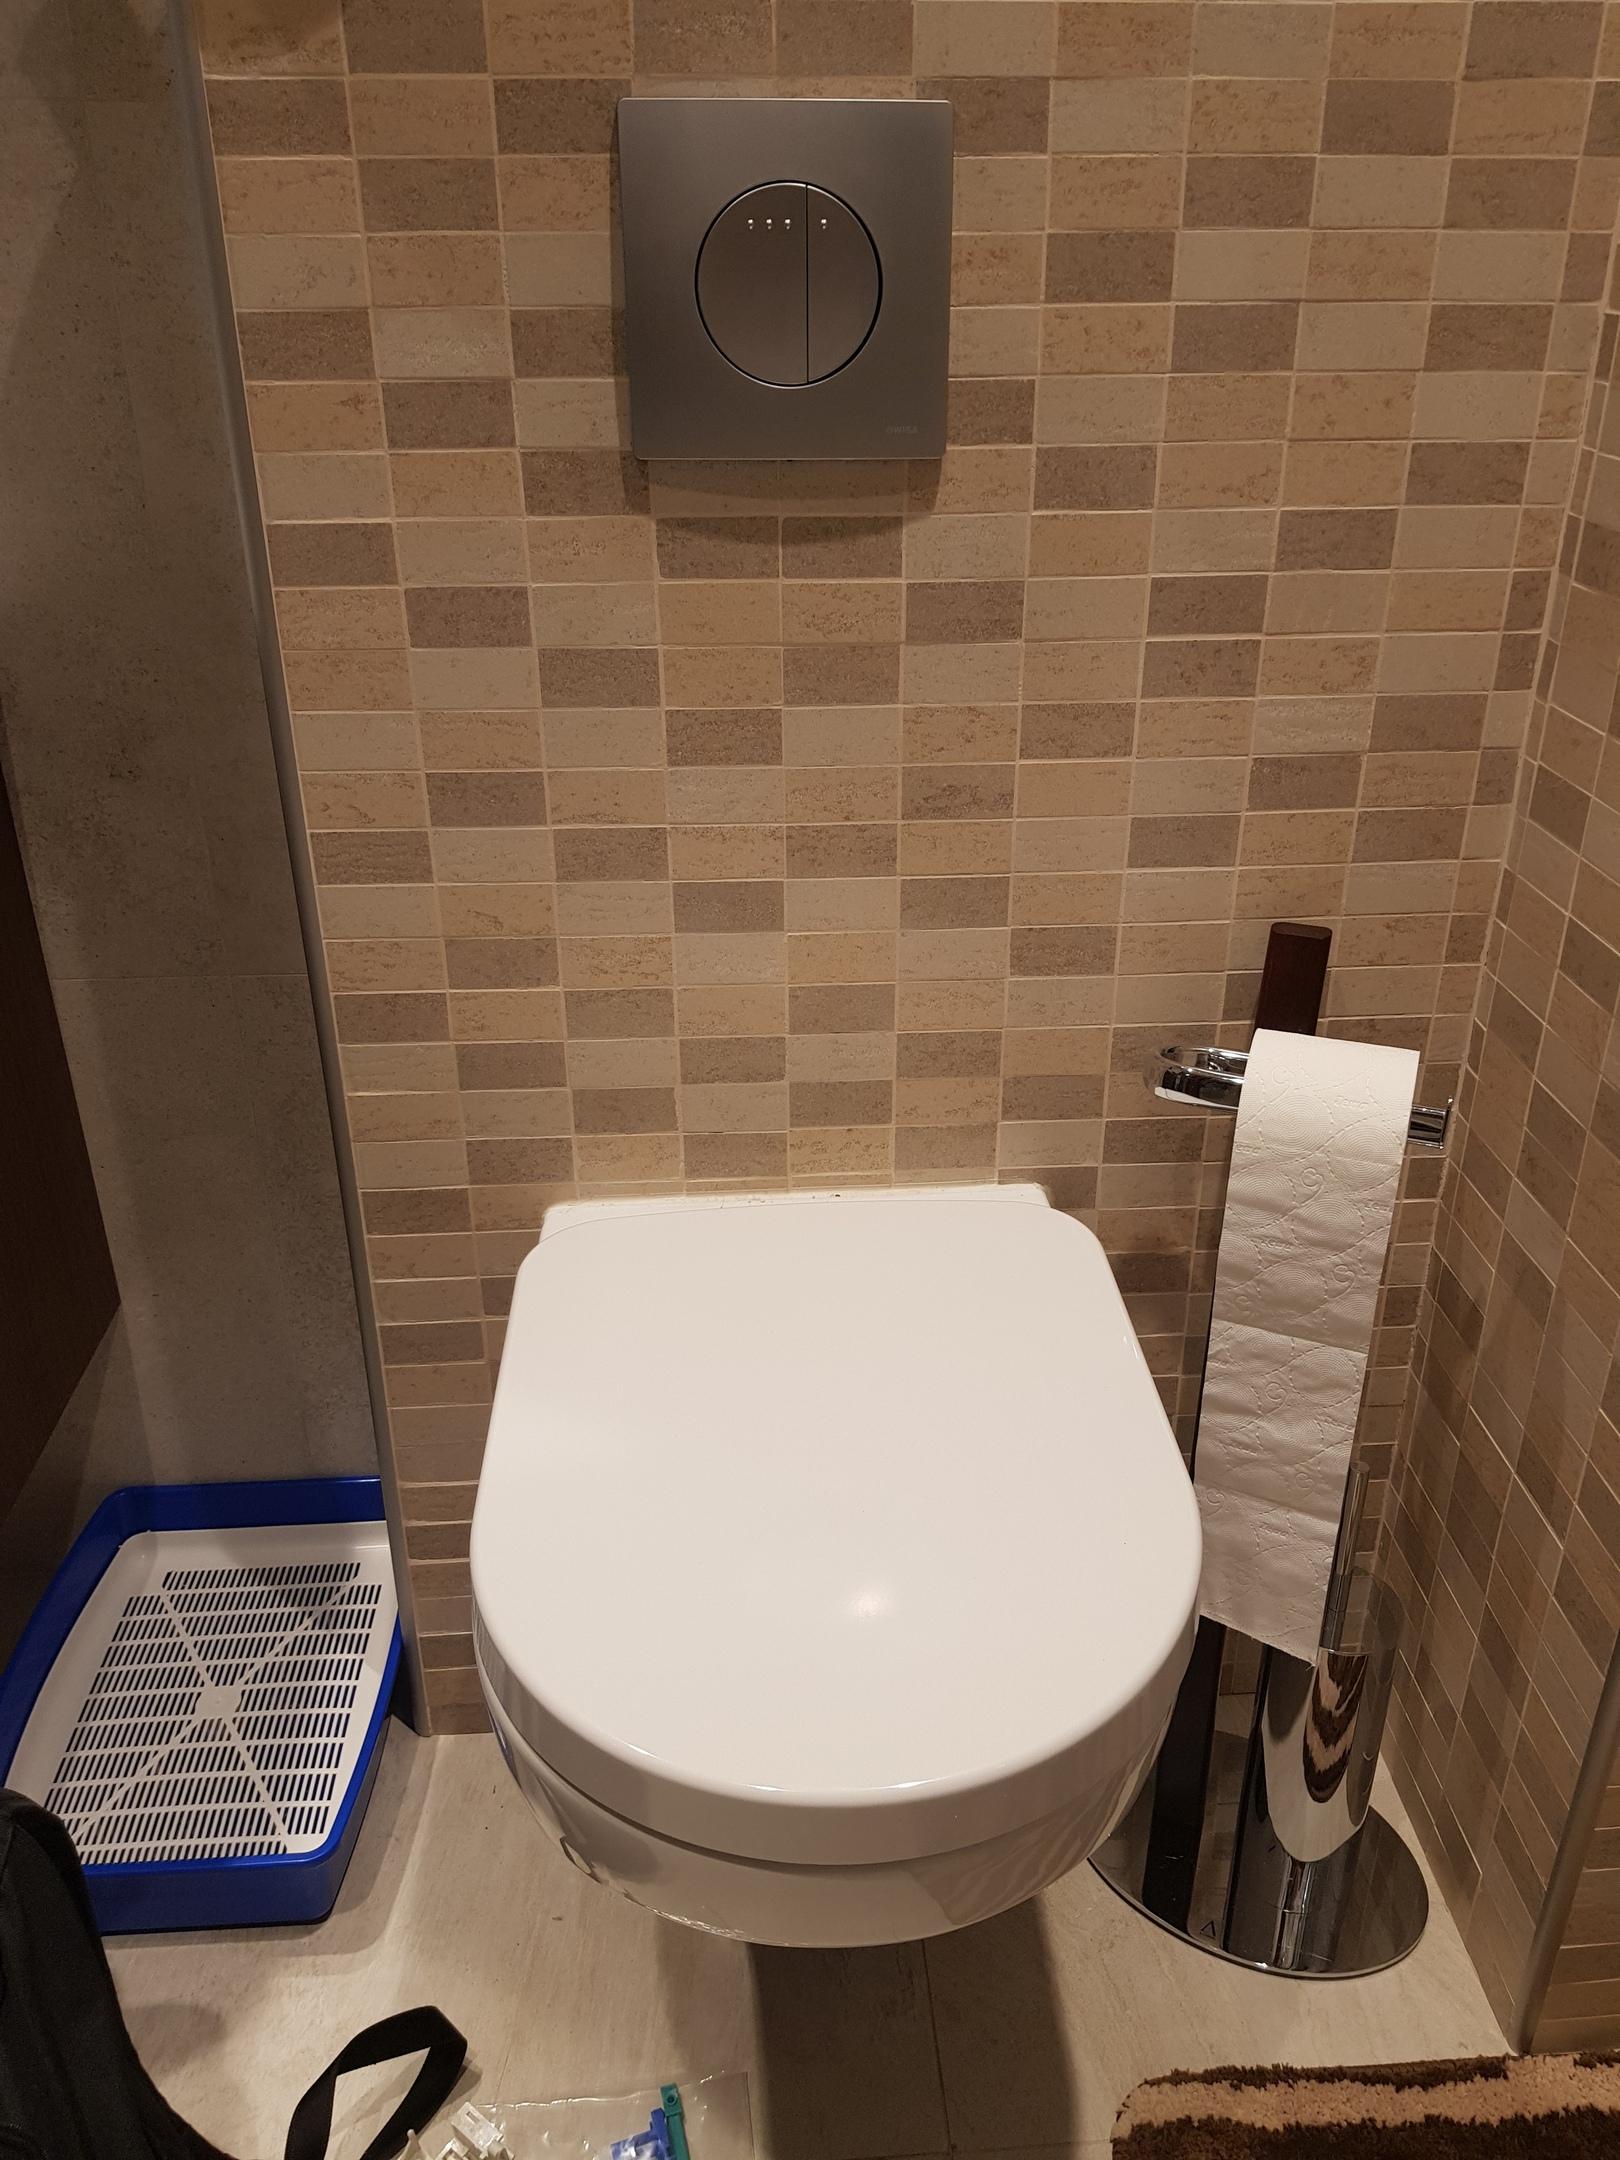 20180108-remont-installacii-wisa-1.jpg